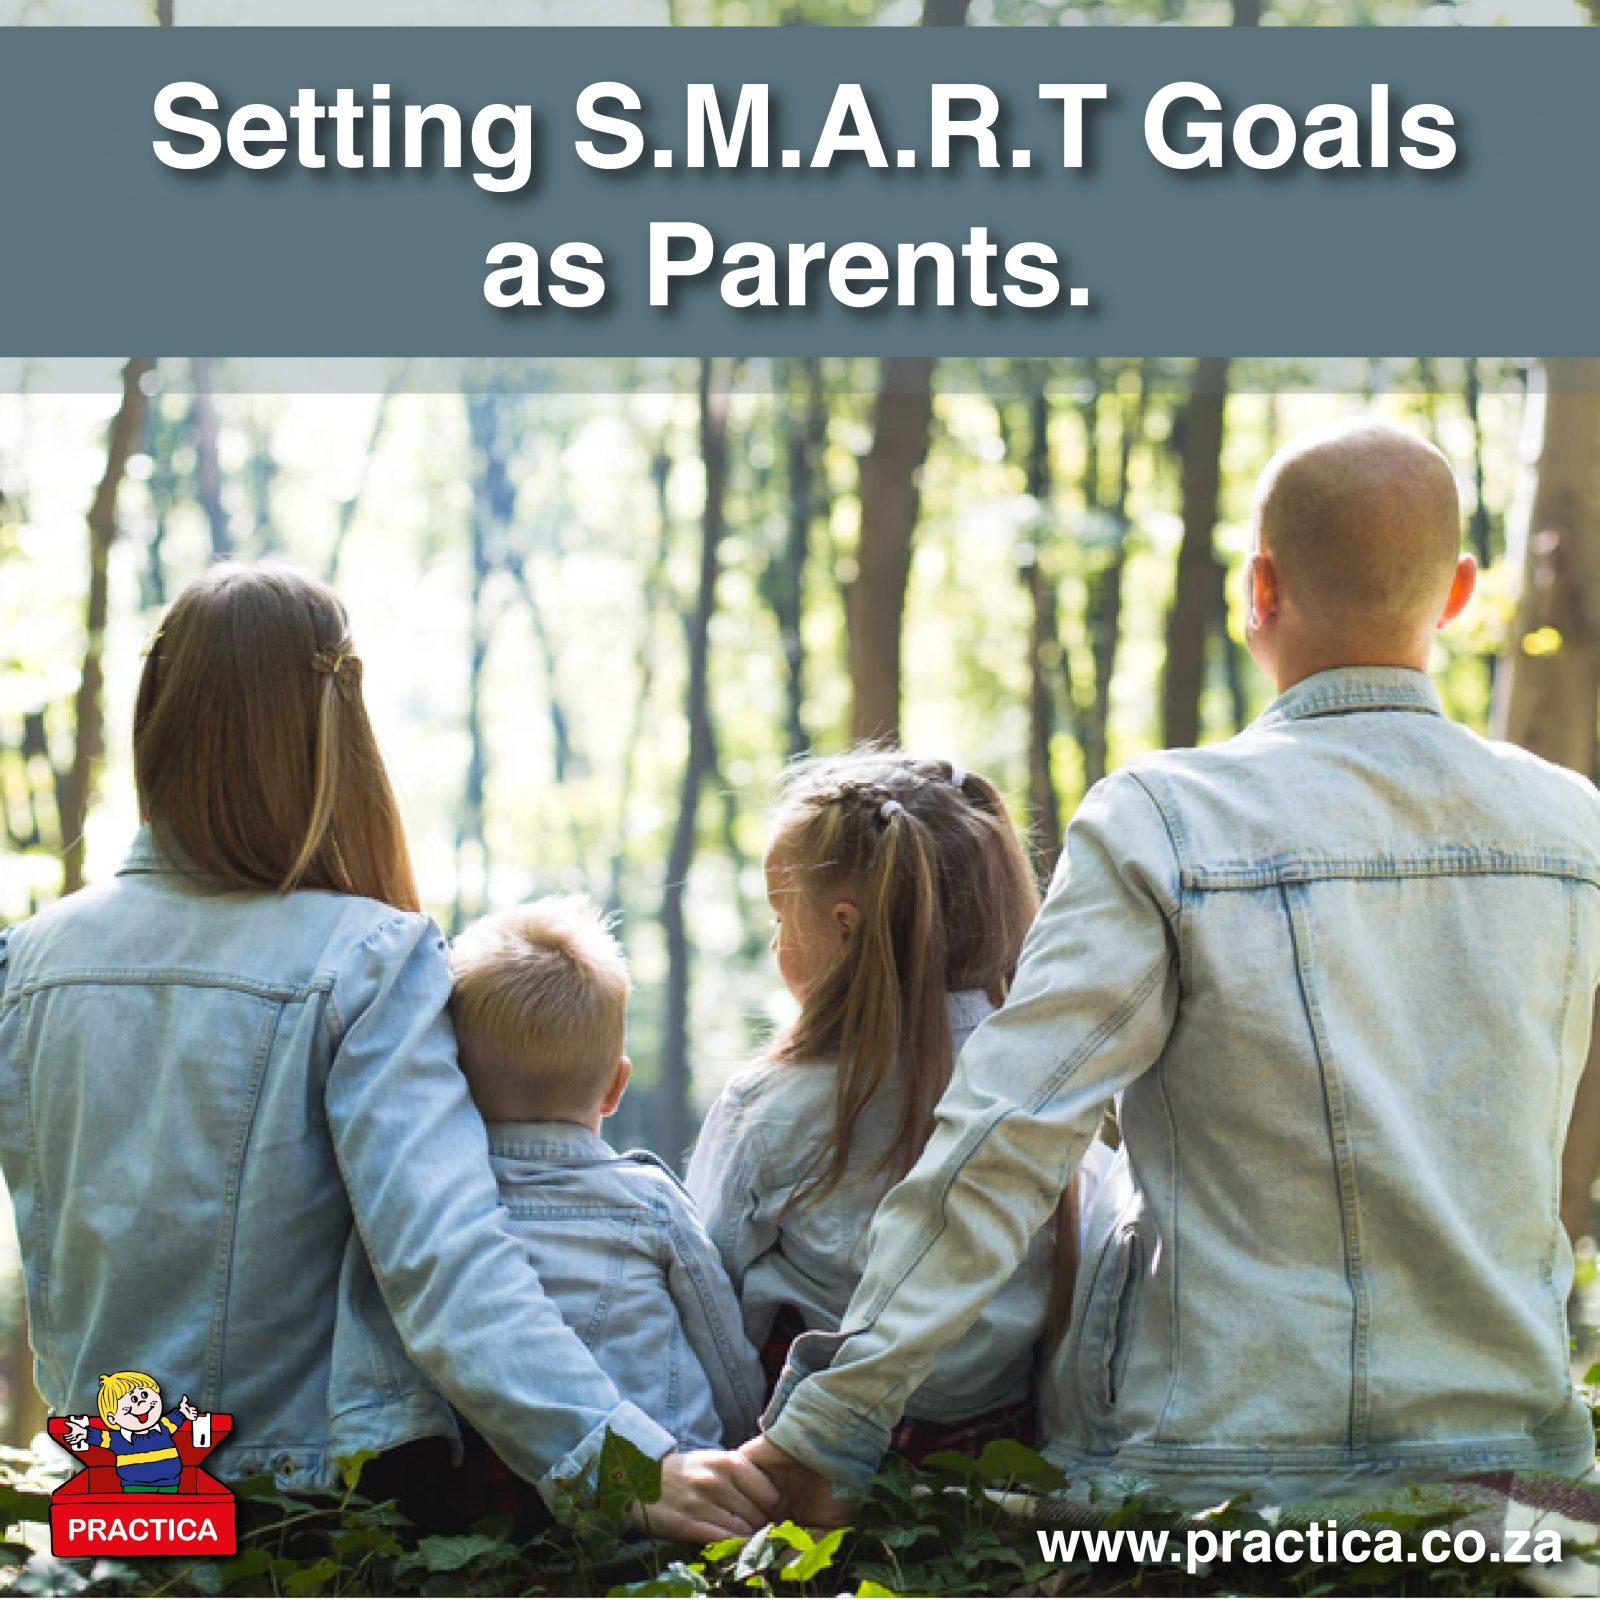 Setting S.M.A.R.T Goals as Parents